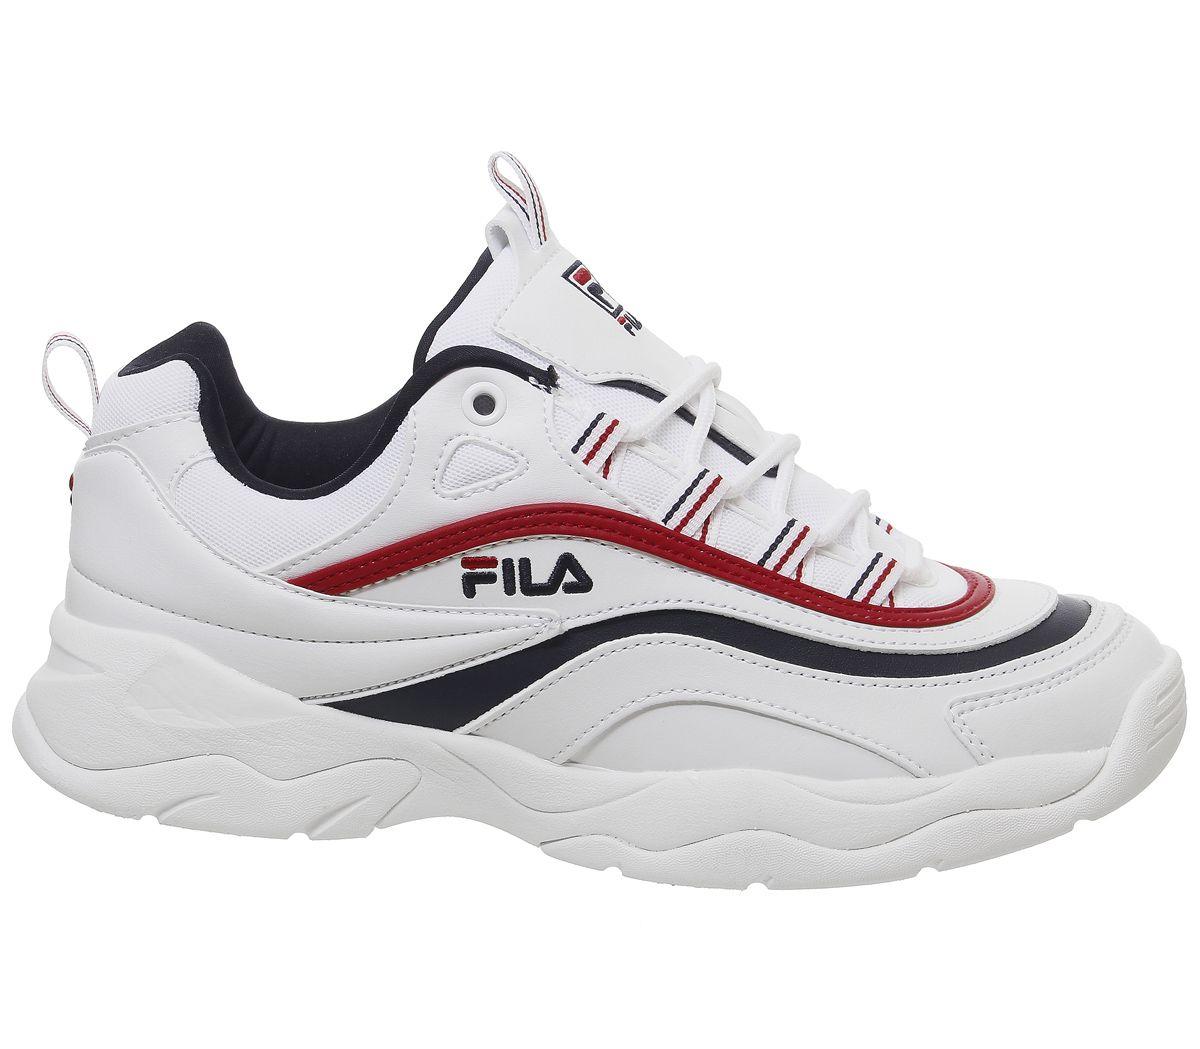 ec2998559535e Sentinel Womens Fila Fila Ray Trainers White Fila Navy Red Trainers Shoes